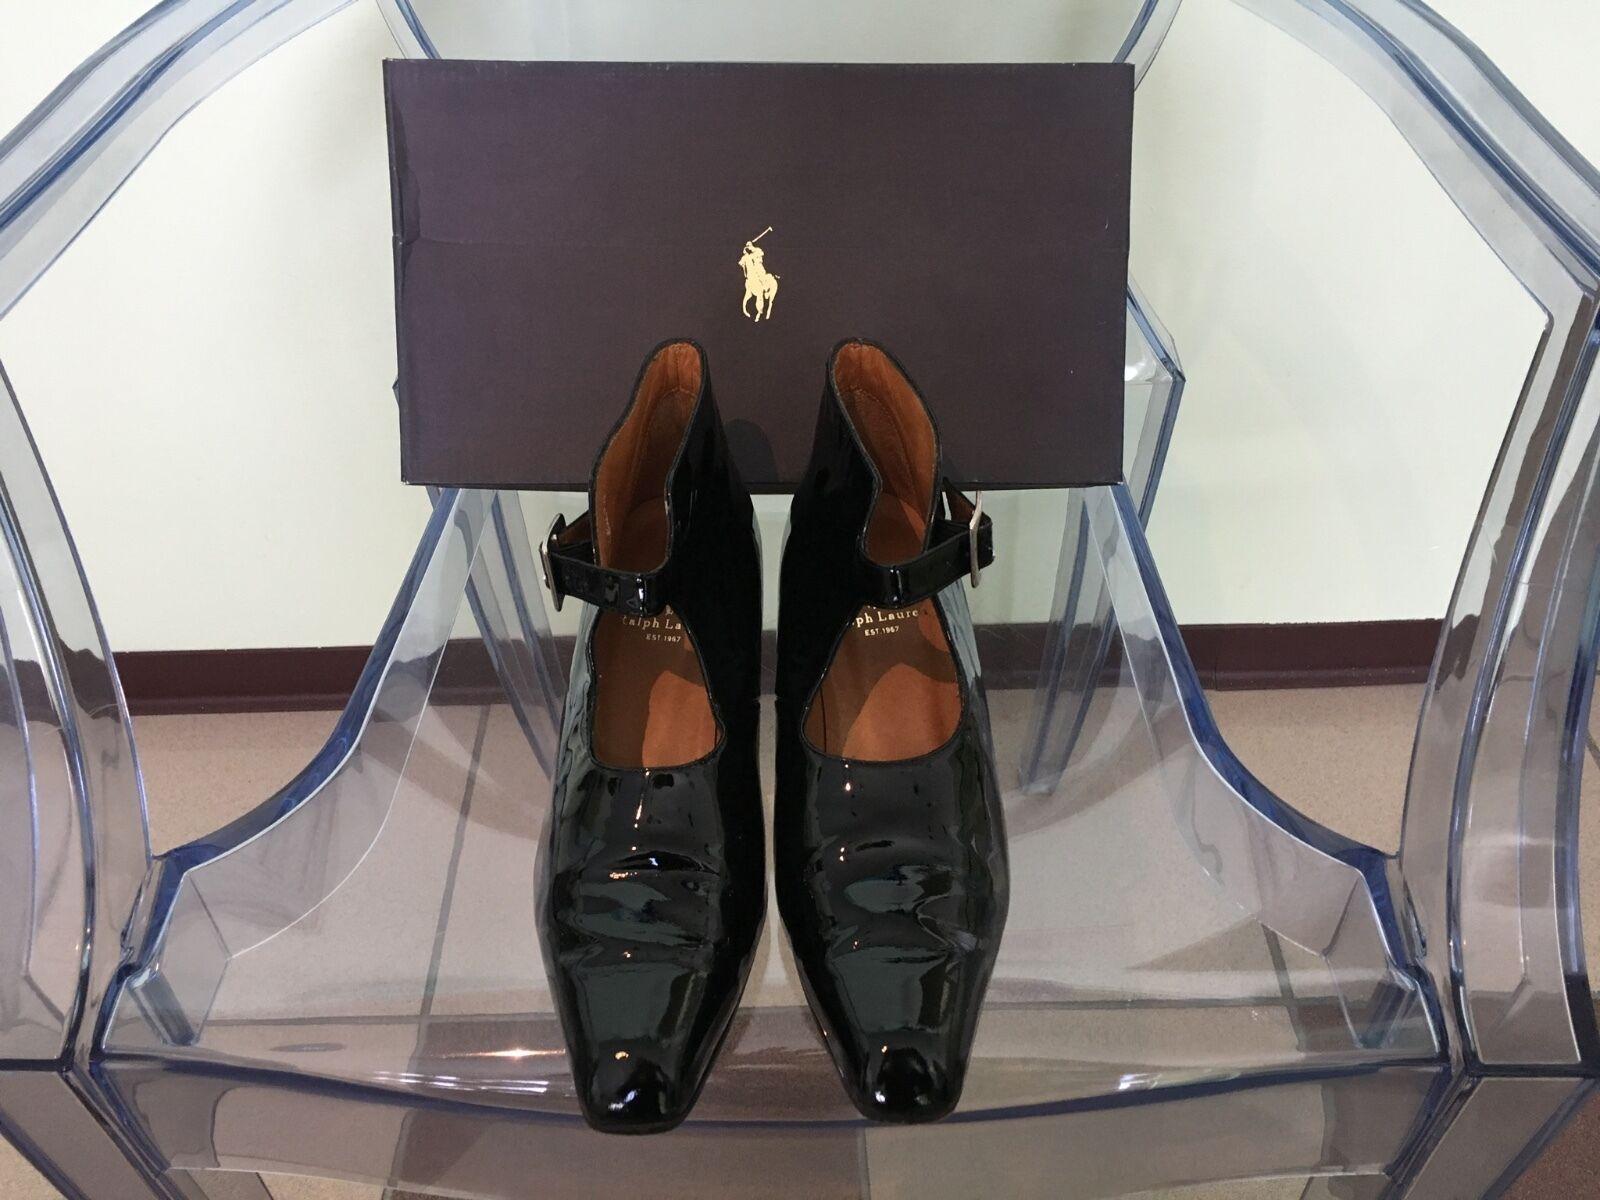 Women's Polo Ralph Lauren Black Patent Leather Mary Jane Pumps Size 7.5B